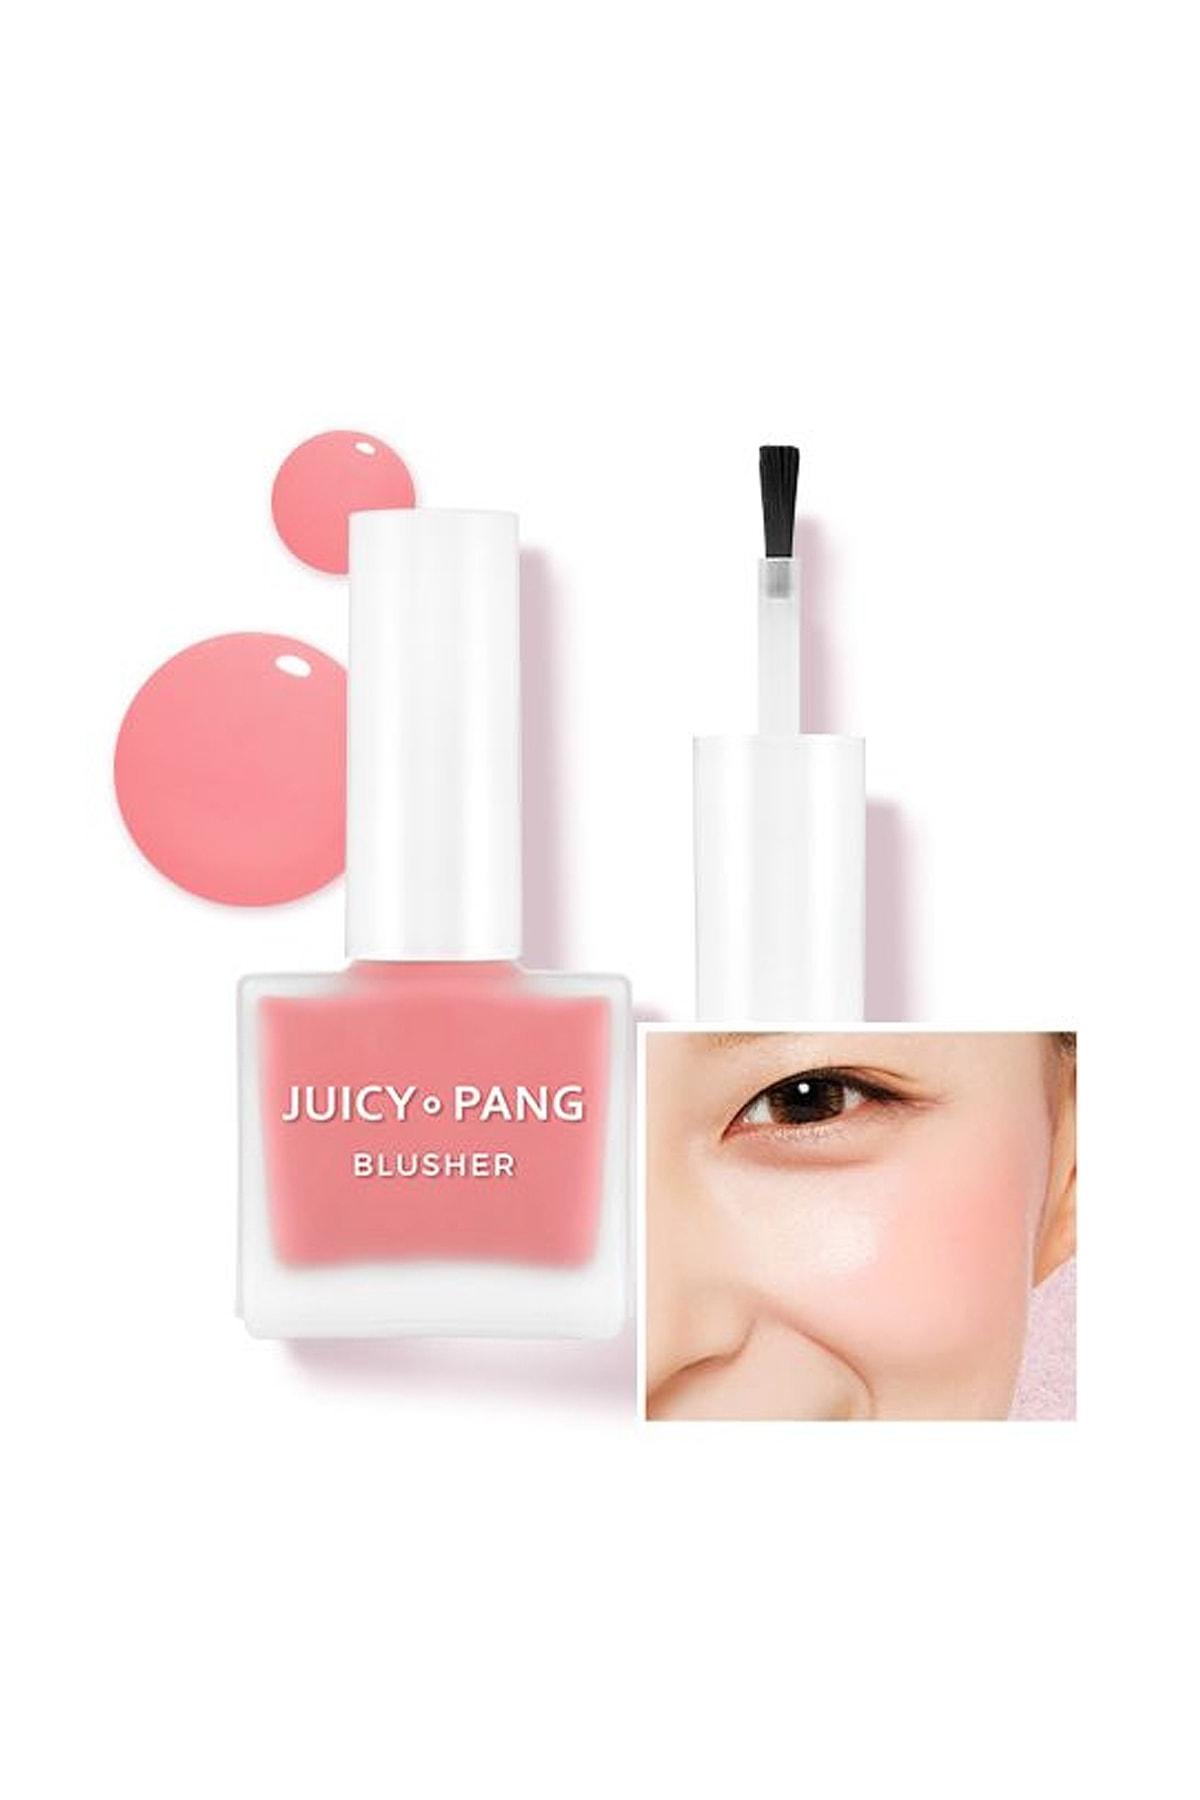 Missha Doğal Görünüm Sunan Nemlendirici Likit Allık 9g. APIEU Juicy-Pang Water Blusher (PK01)